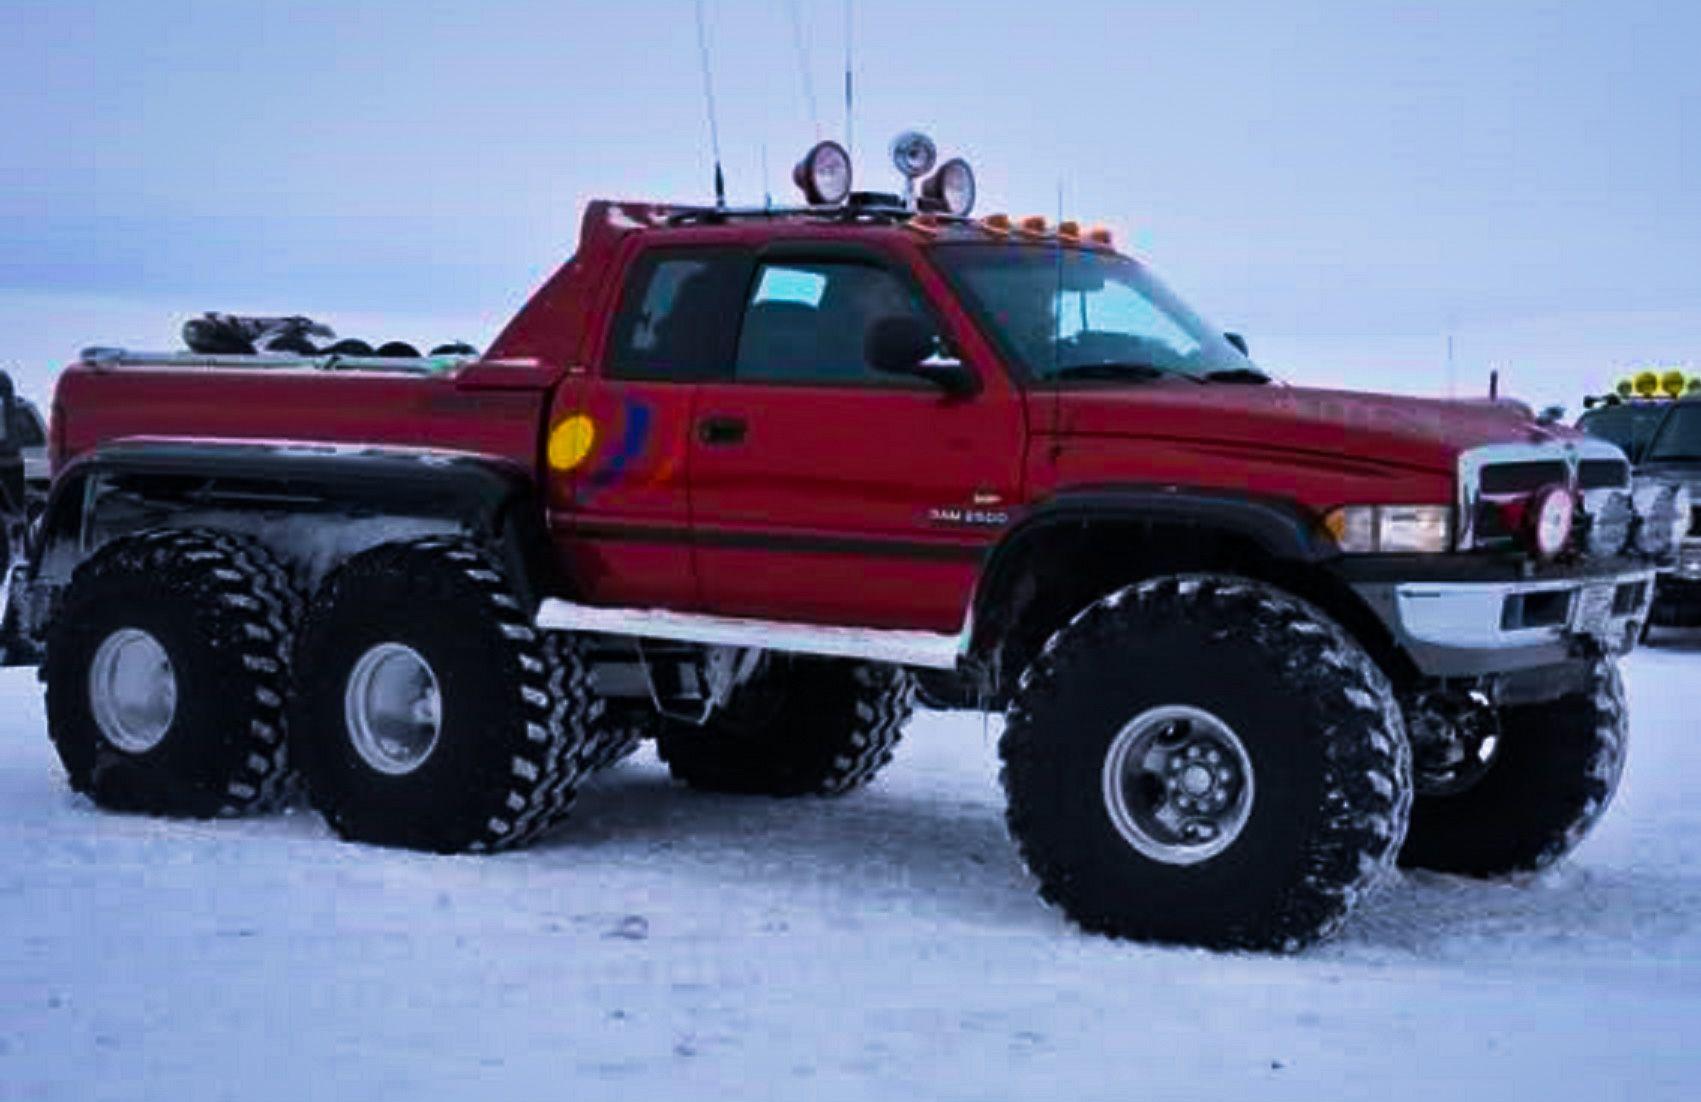 All Terrain 6x6 Dodge Ram In Iceland Cummins 6x6 Truck Pickup